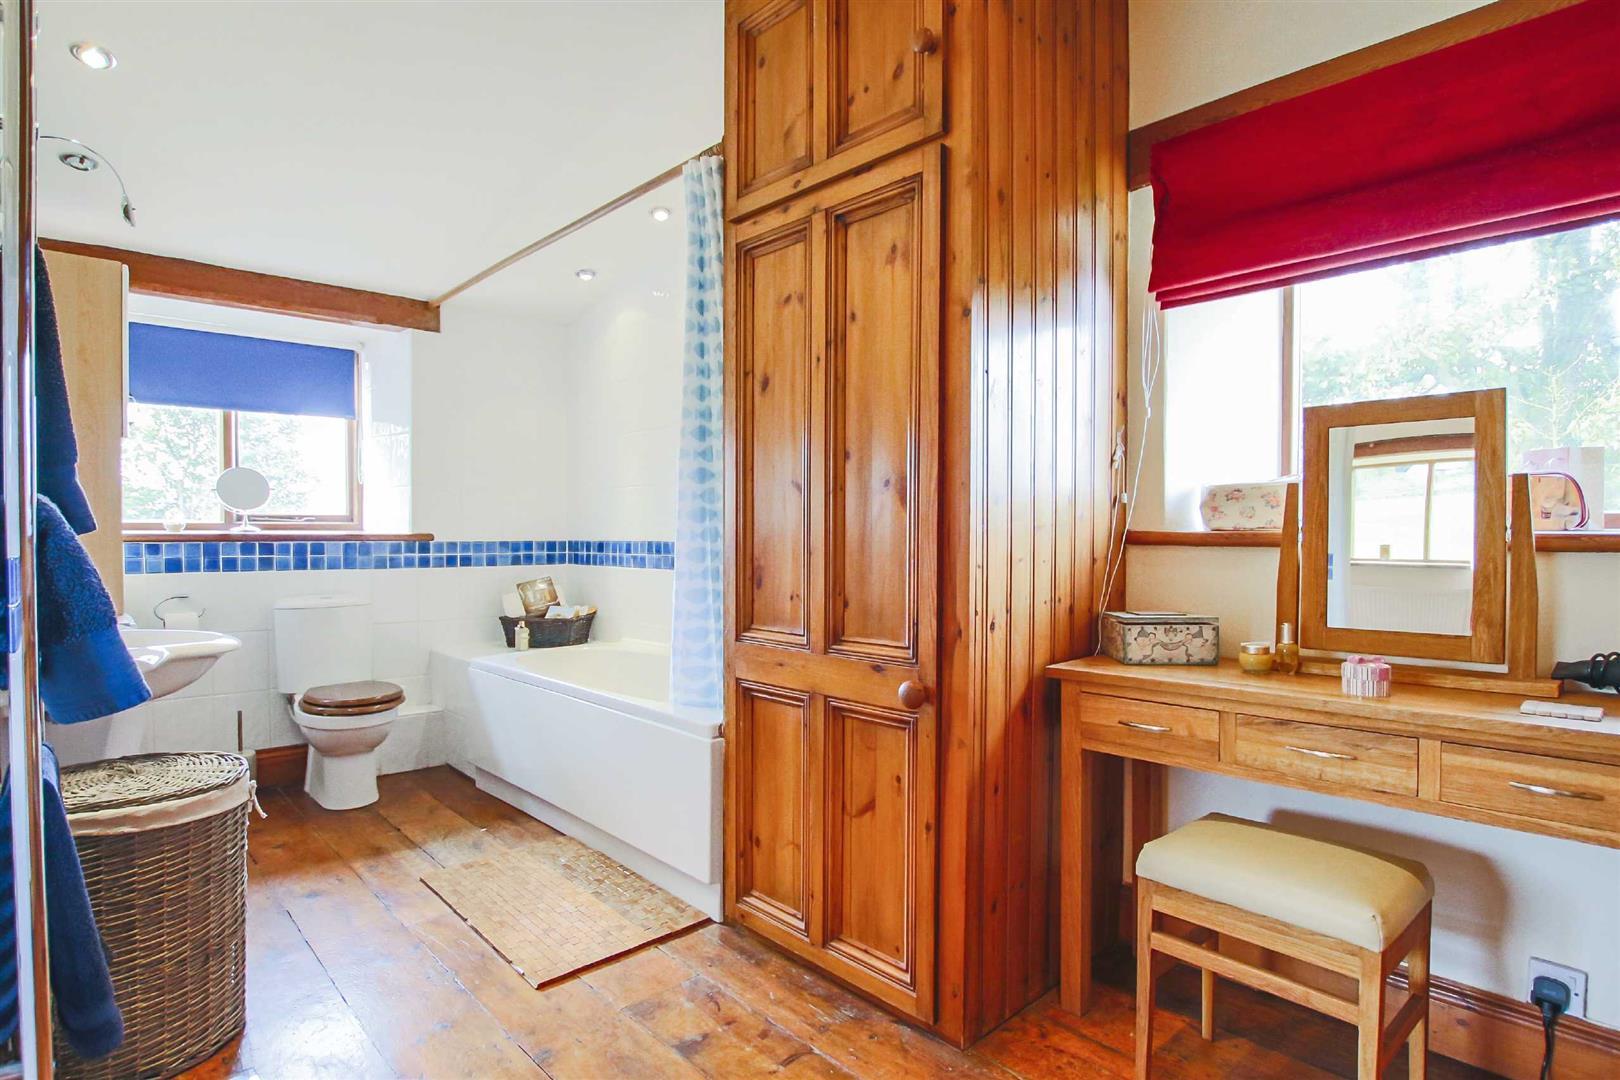 5 Bedroom Barn Conversion For Sale - p026519_22.jpg